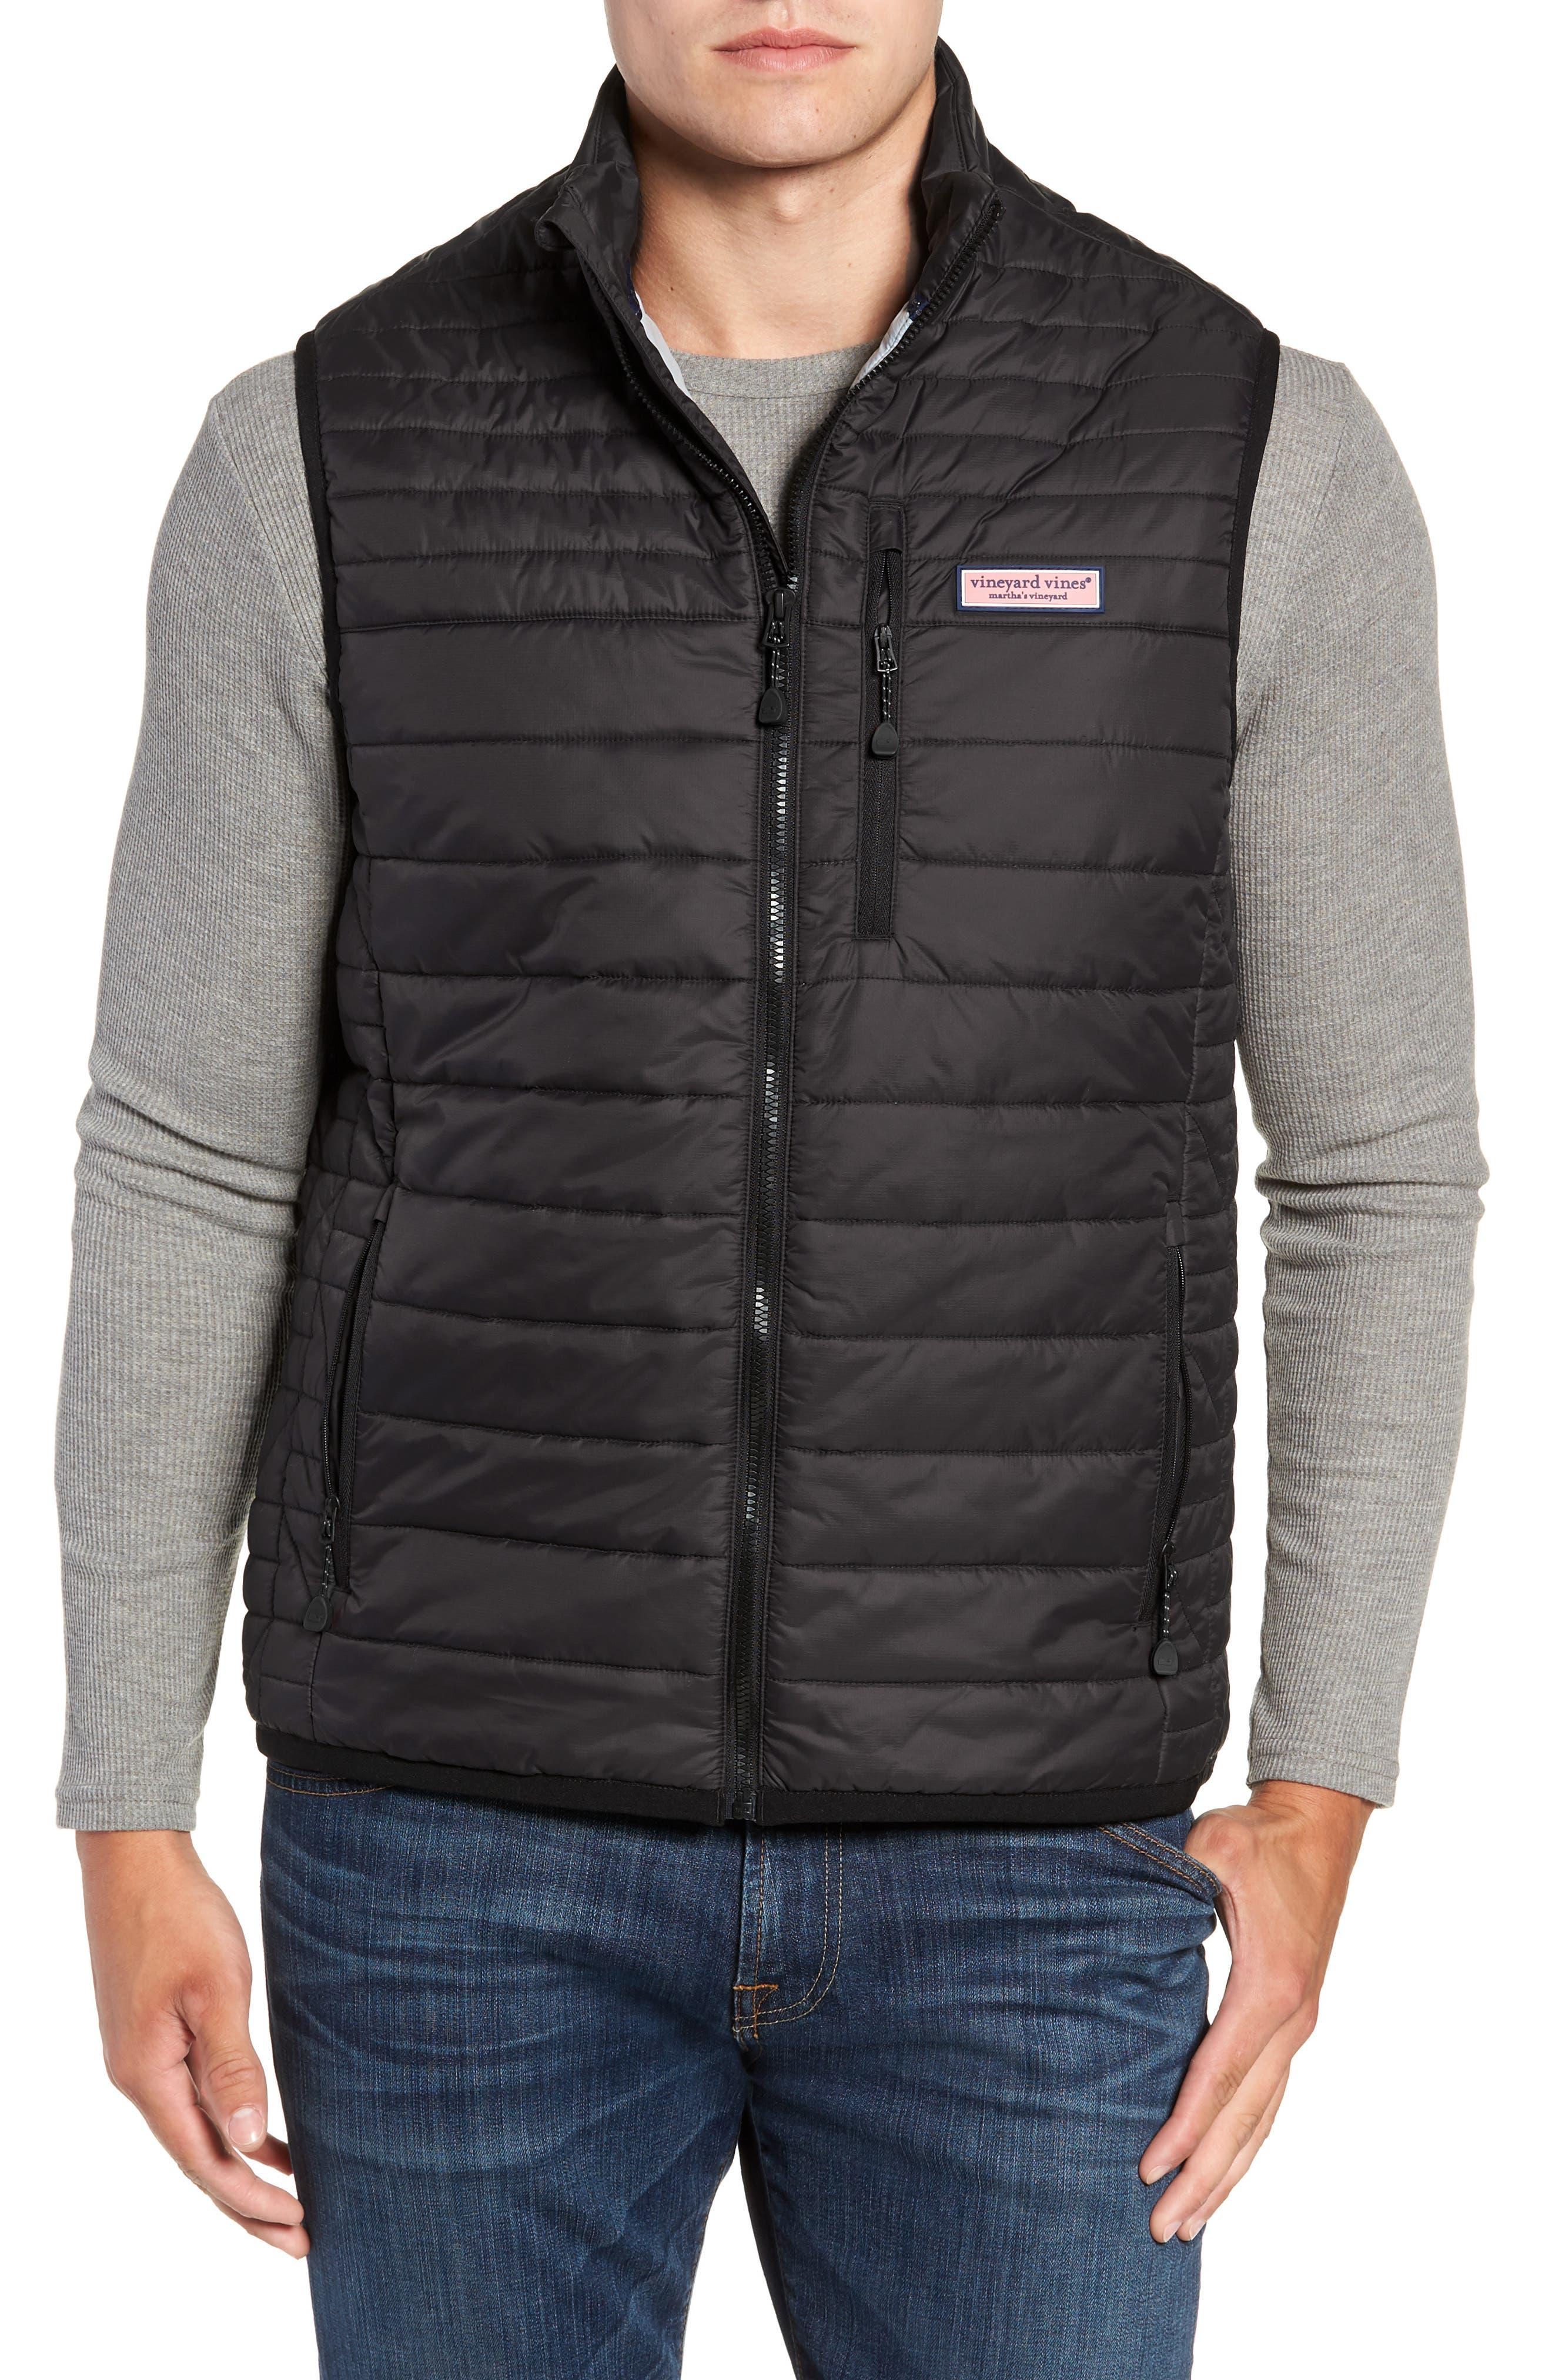 VINEYARD VINES Regular Fit Down Mountain Vest, Main, color, 002